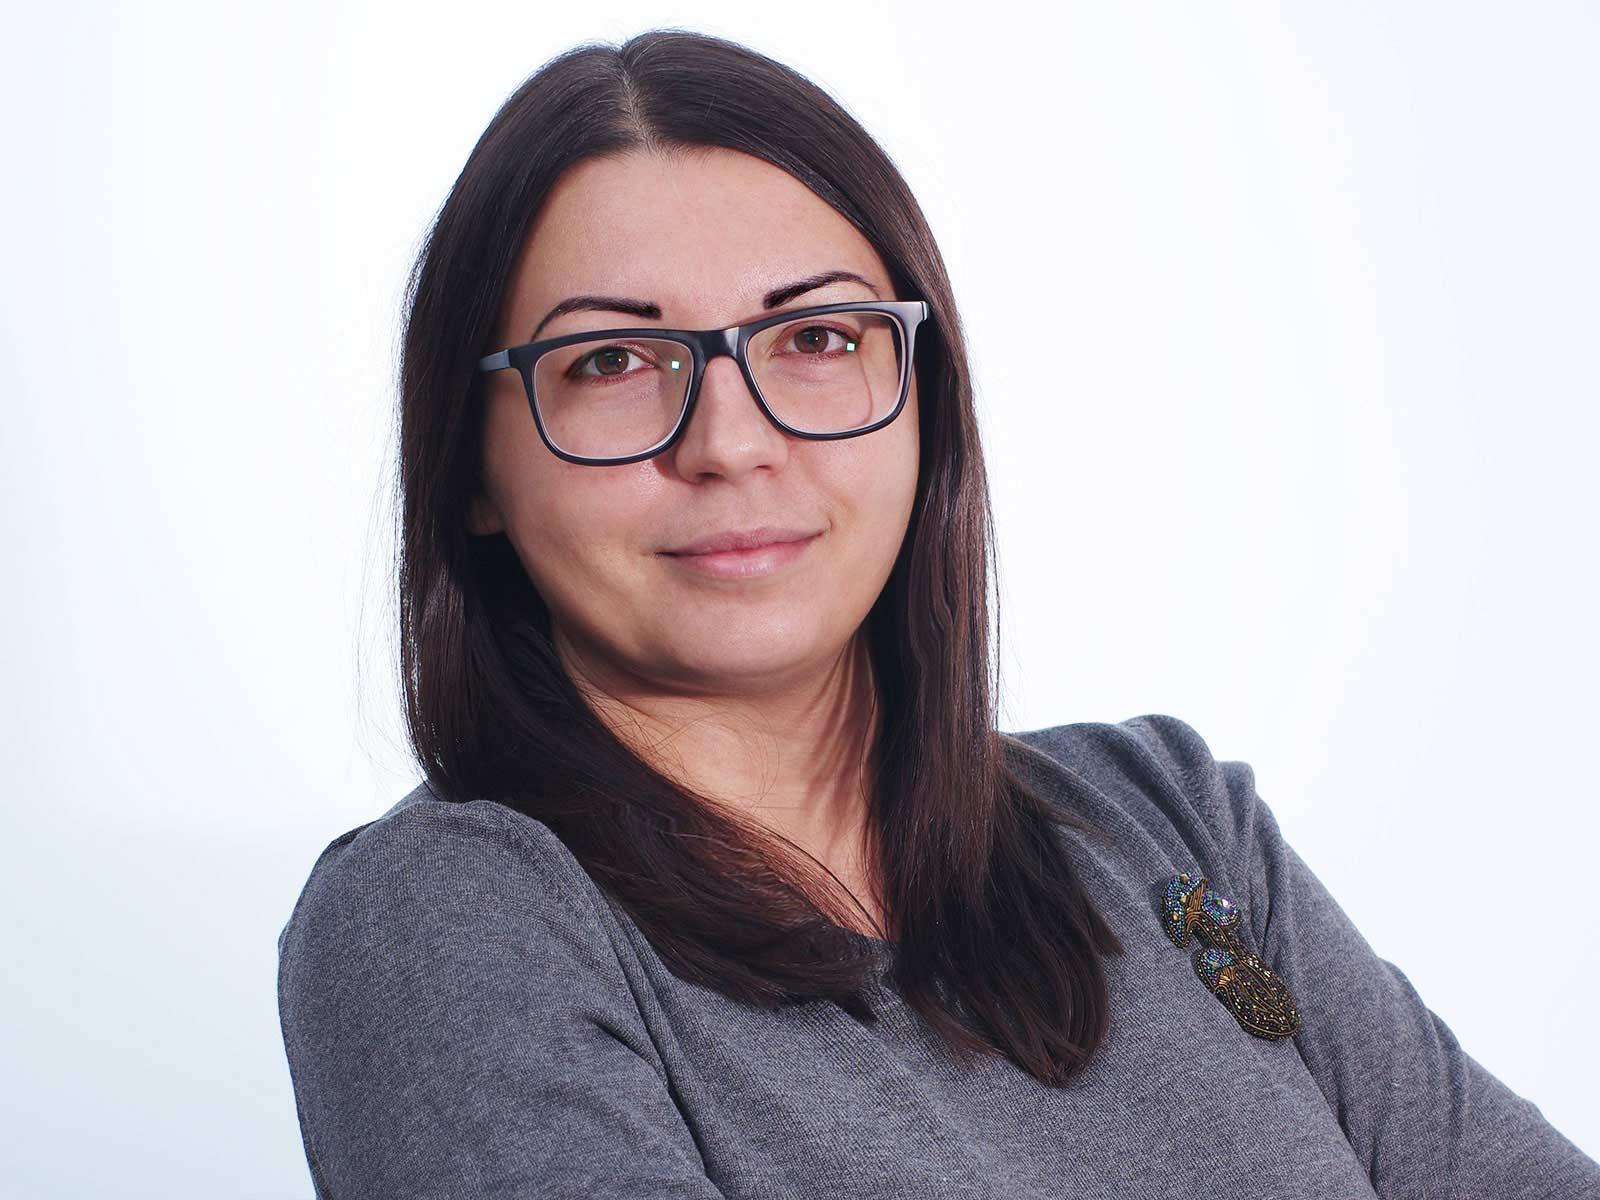 Анна Пенчукова, управляющий партнер digital-агентства WEB-AiM